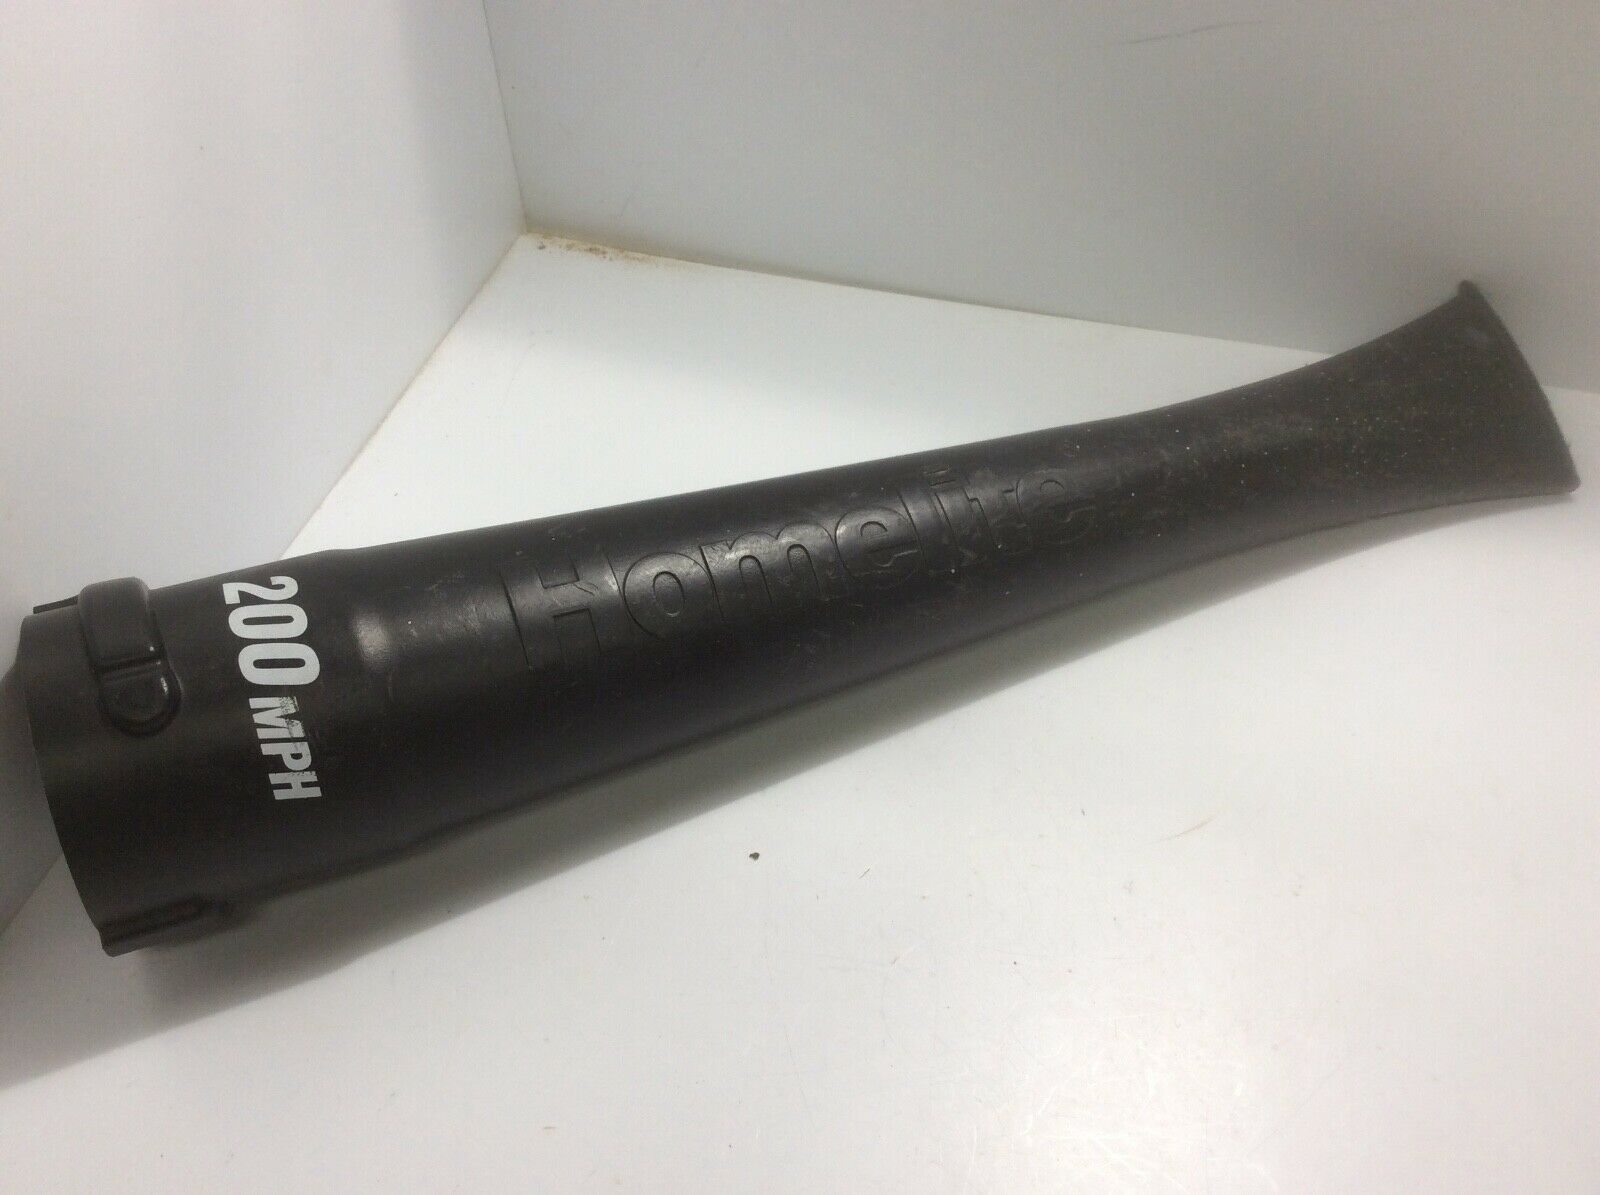 GAS FUEL CAP HOMELITE BLOWER YARDVARK YARD BROOM HB290 HB100 BX90 D25B HB25150V